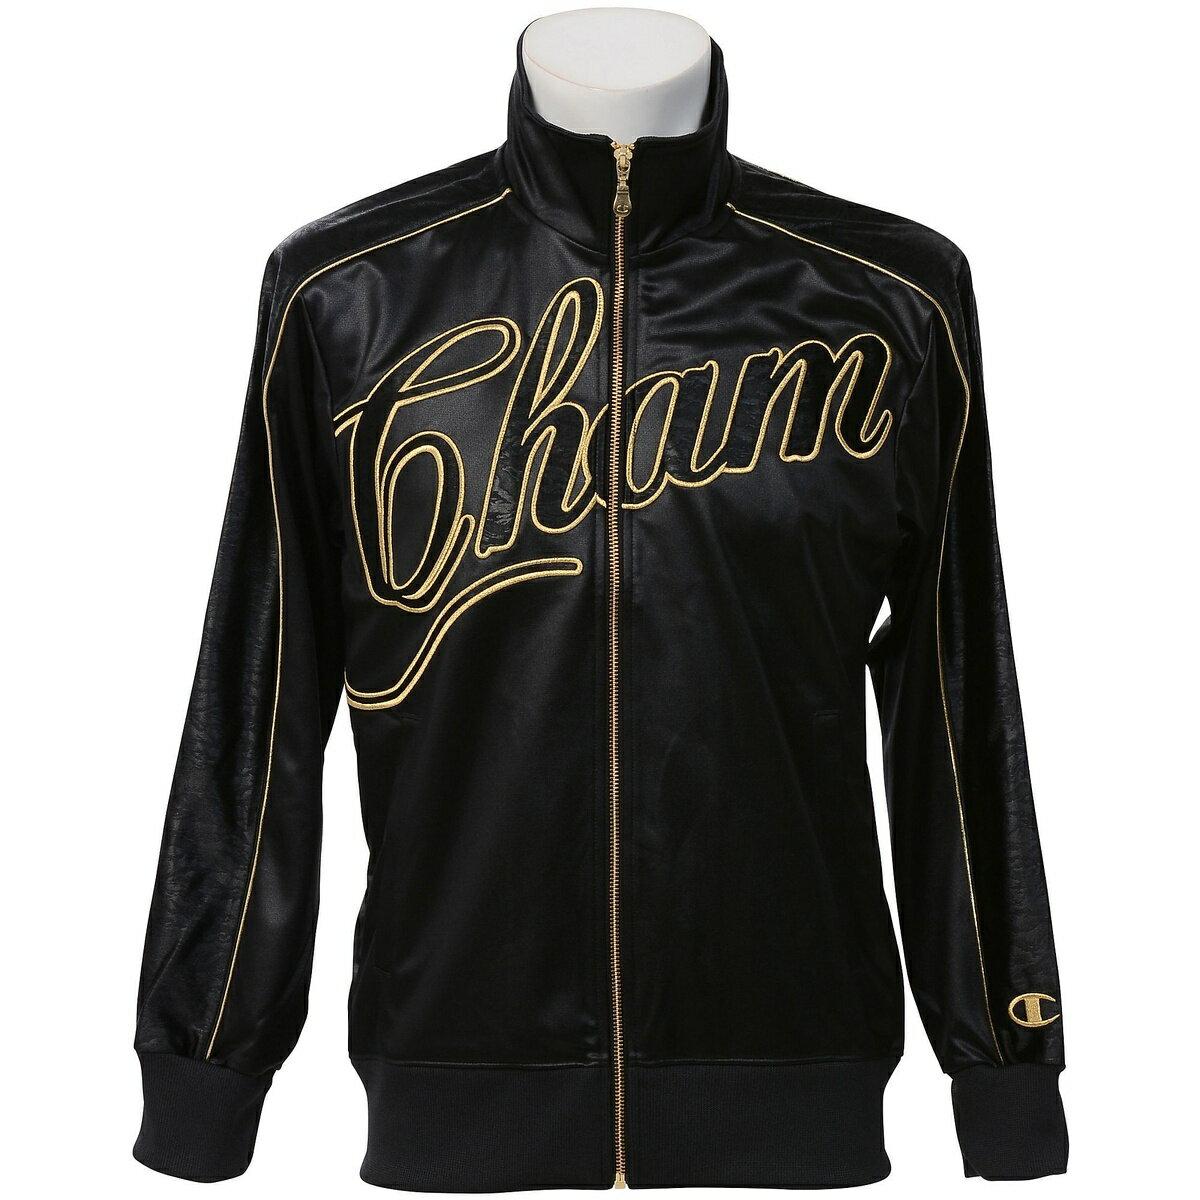 ● Champion (チャンピオン) メンズスポーツウェア ウォームアップジャケット ジップジャージージャケット ブラック Z CW1317-K